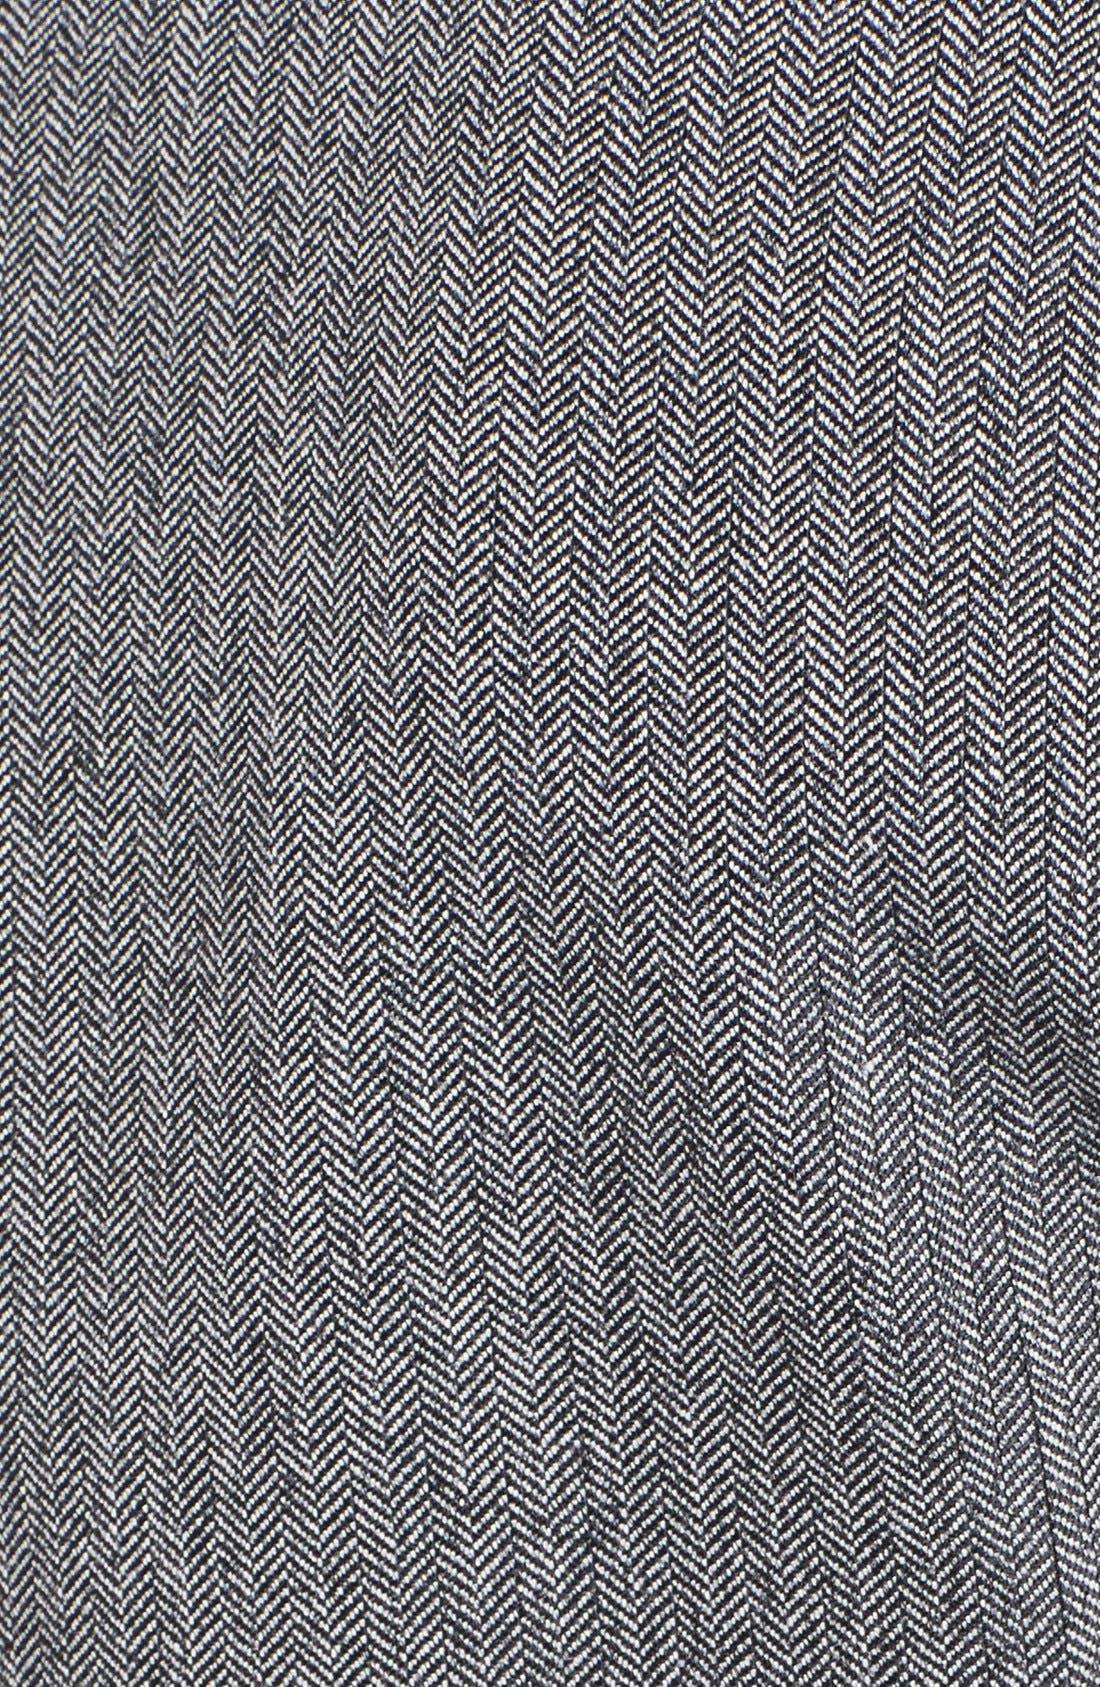 Alternate Image 3  - Anne Klein Herringbone Blazer (Petite)